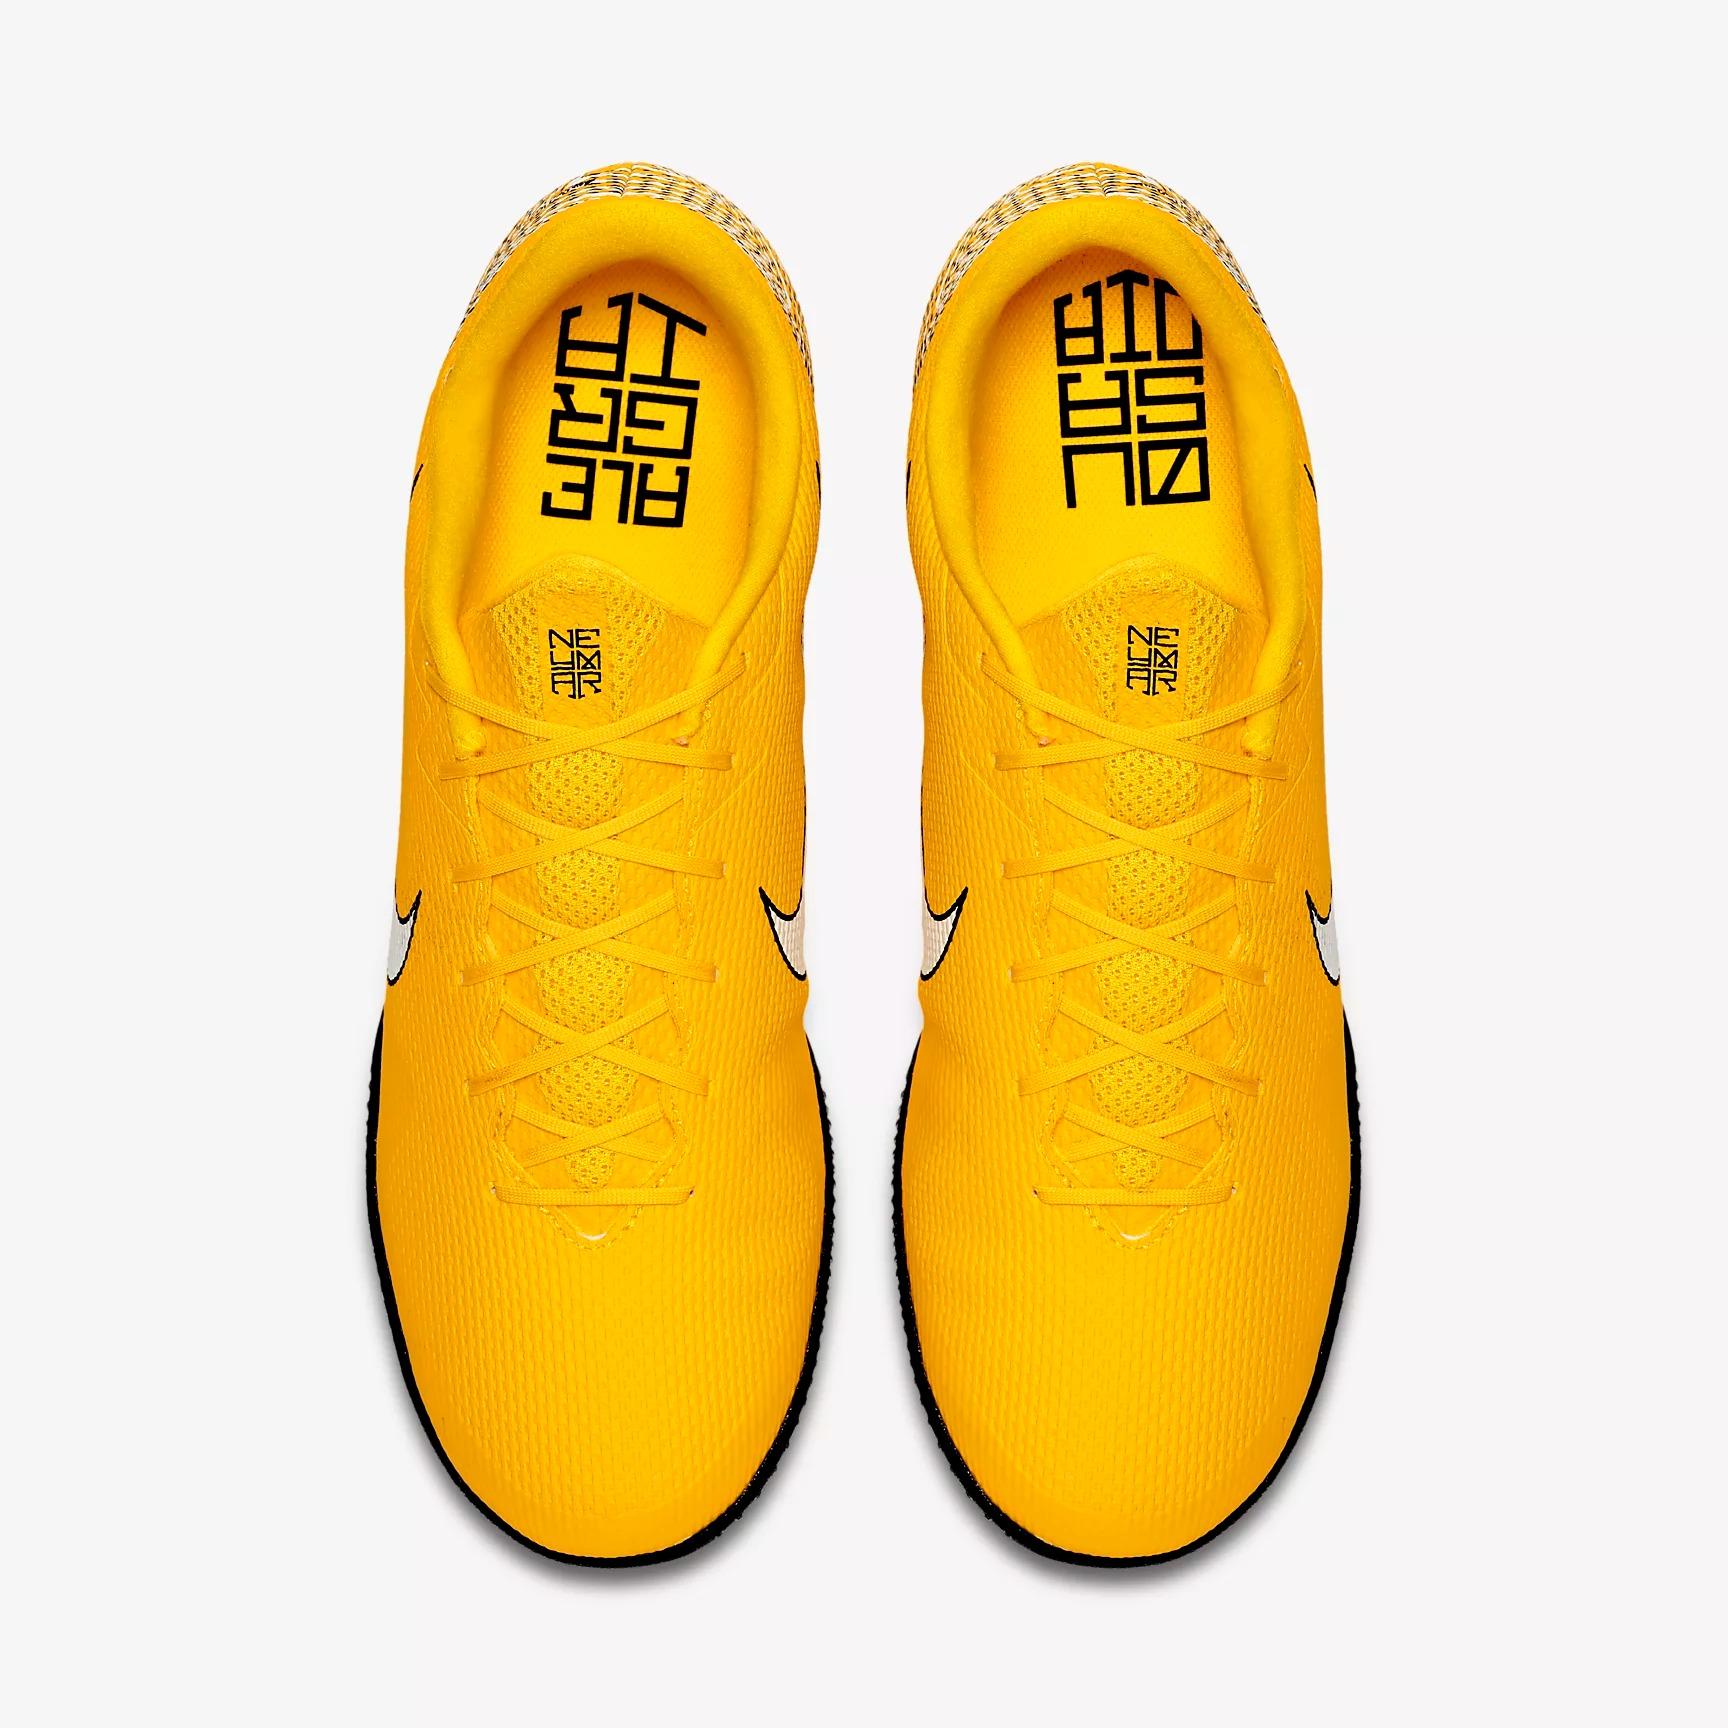 save off 3bcf7 8e8a0 Nike Mercurial Vapor XII Academy Neymar Jr. IC Soccer Cleats